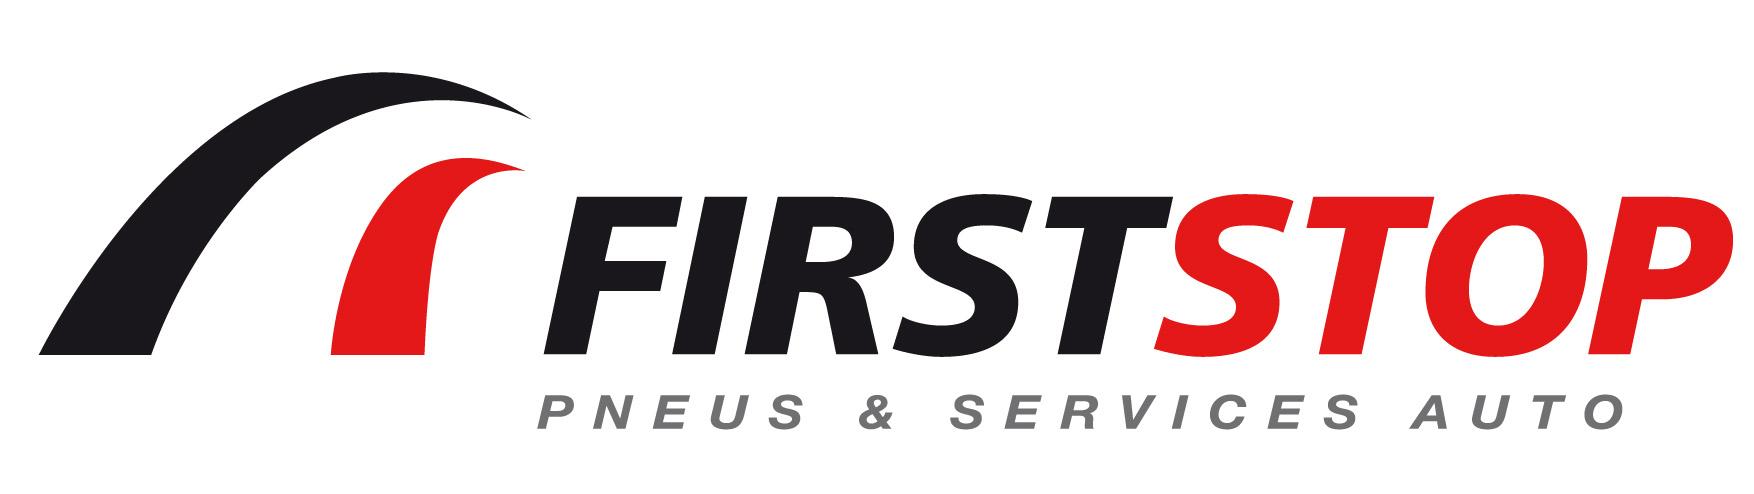 FirstStop logo.jpg